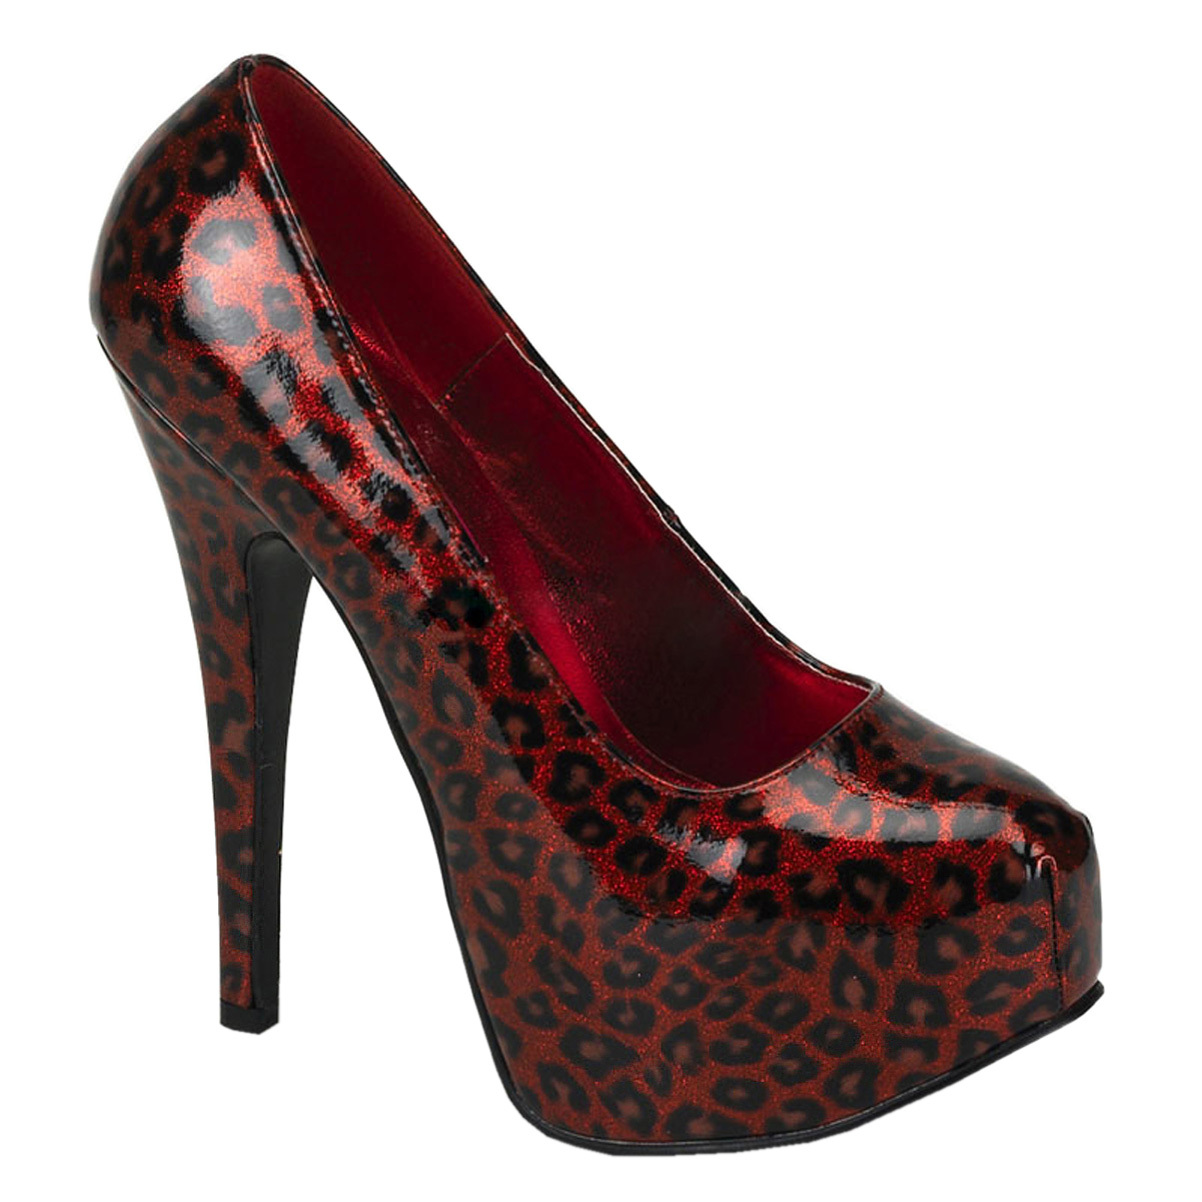 Bordello Womens Animal Print Pumps 5 3/4 Inch Heel Metall...